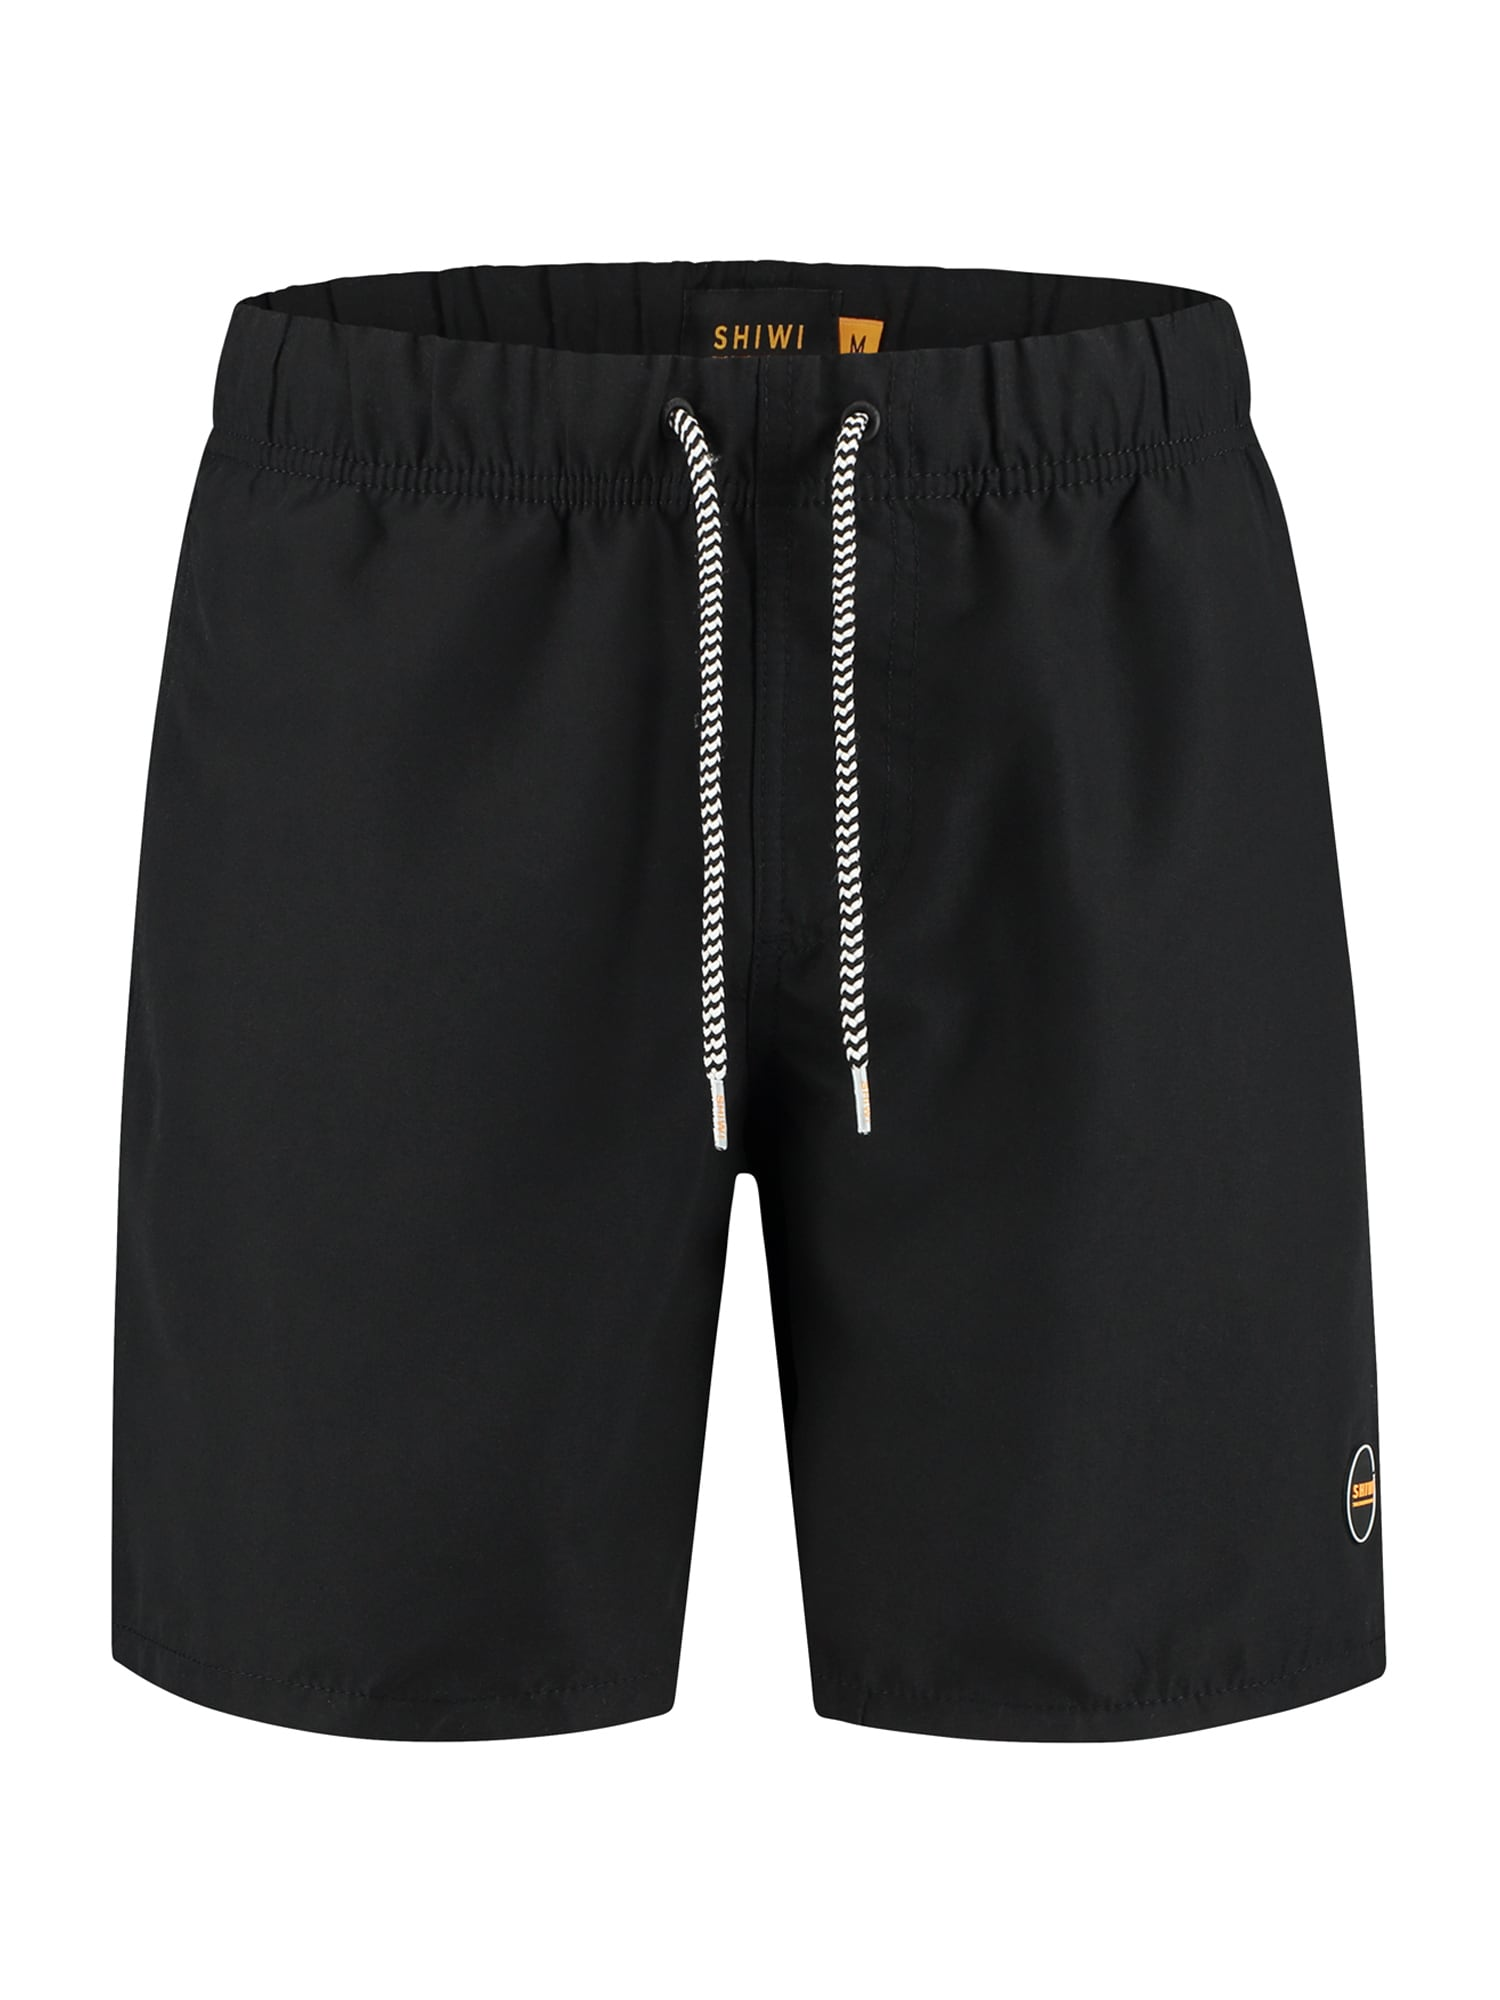 Shiwi Plavky 'Solid mike'  čierna